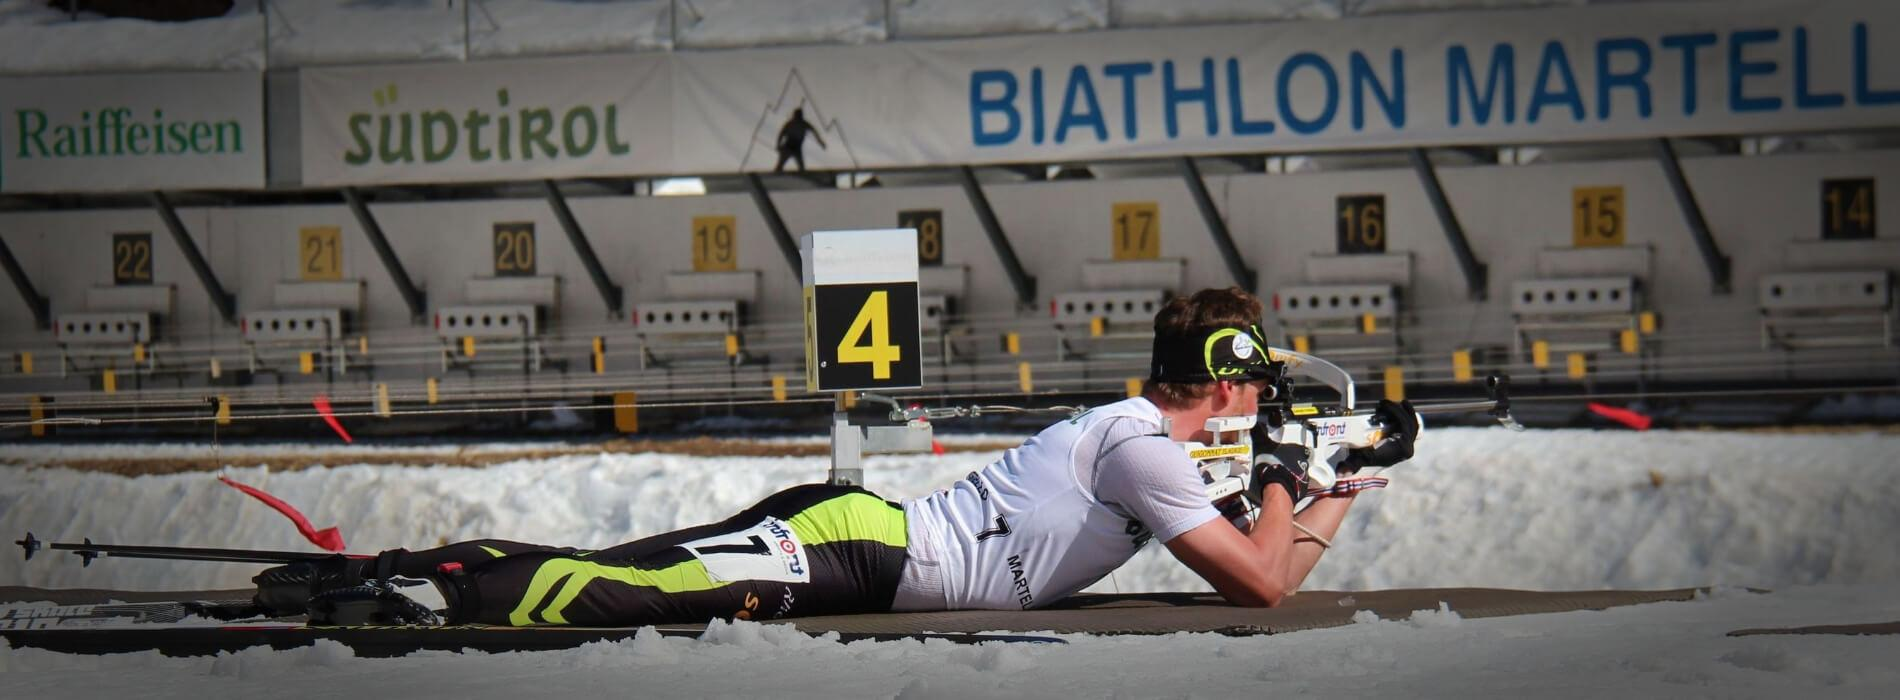 Biathlon Martell